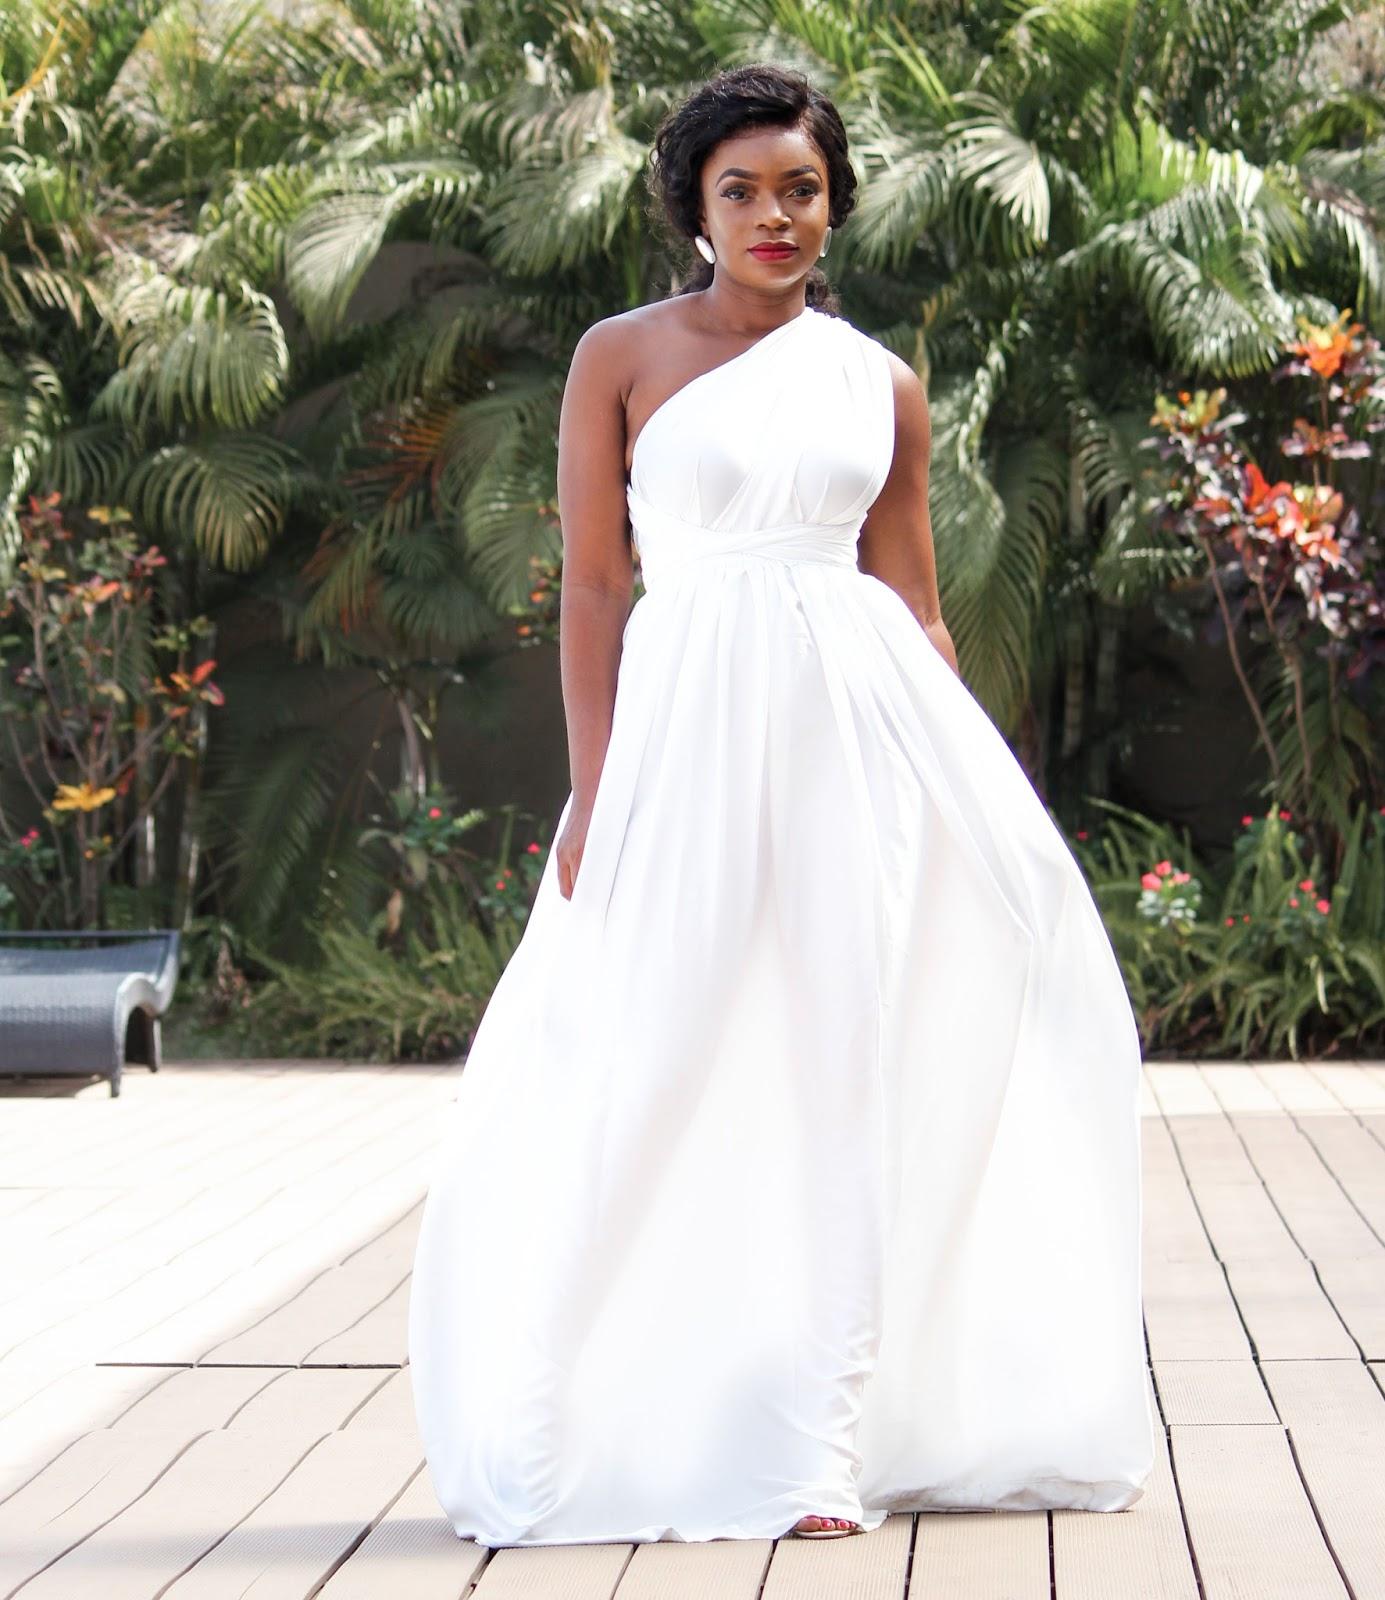 MULTI-WAY MAXI DRESS - White Multi-Way Maxi Dress from Porshher